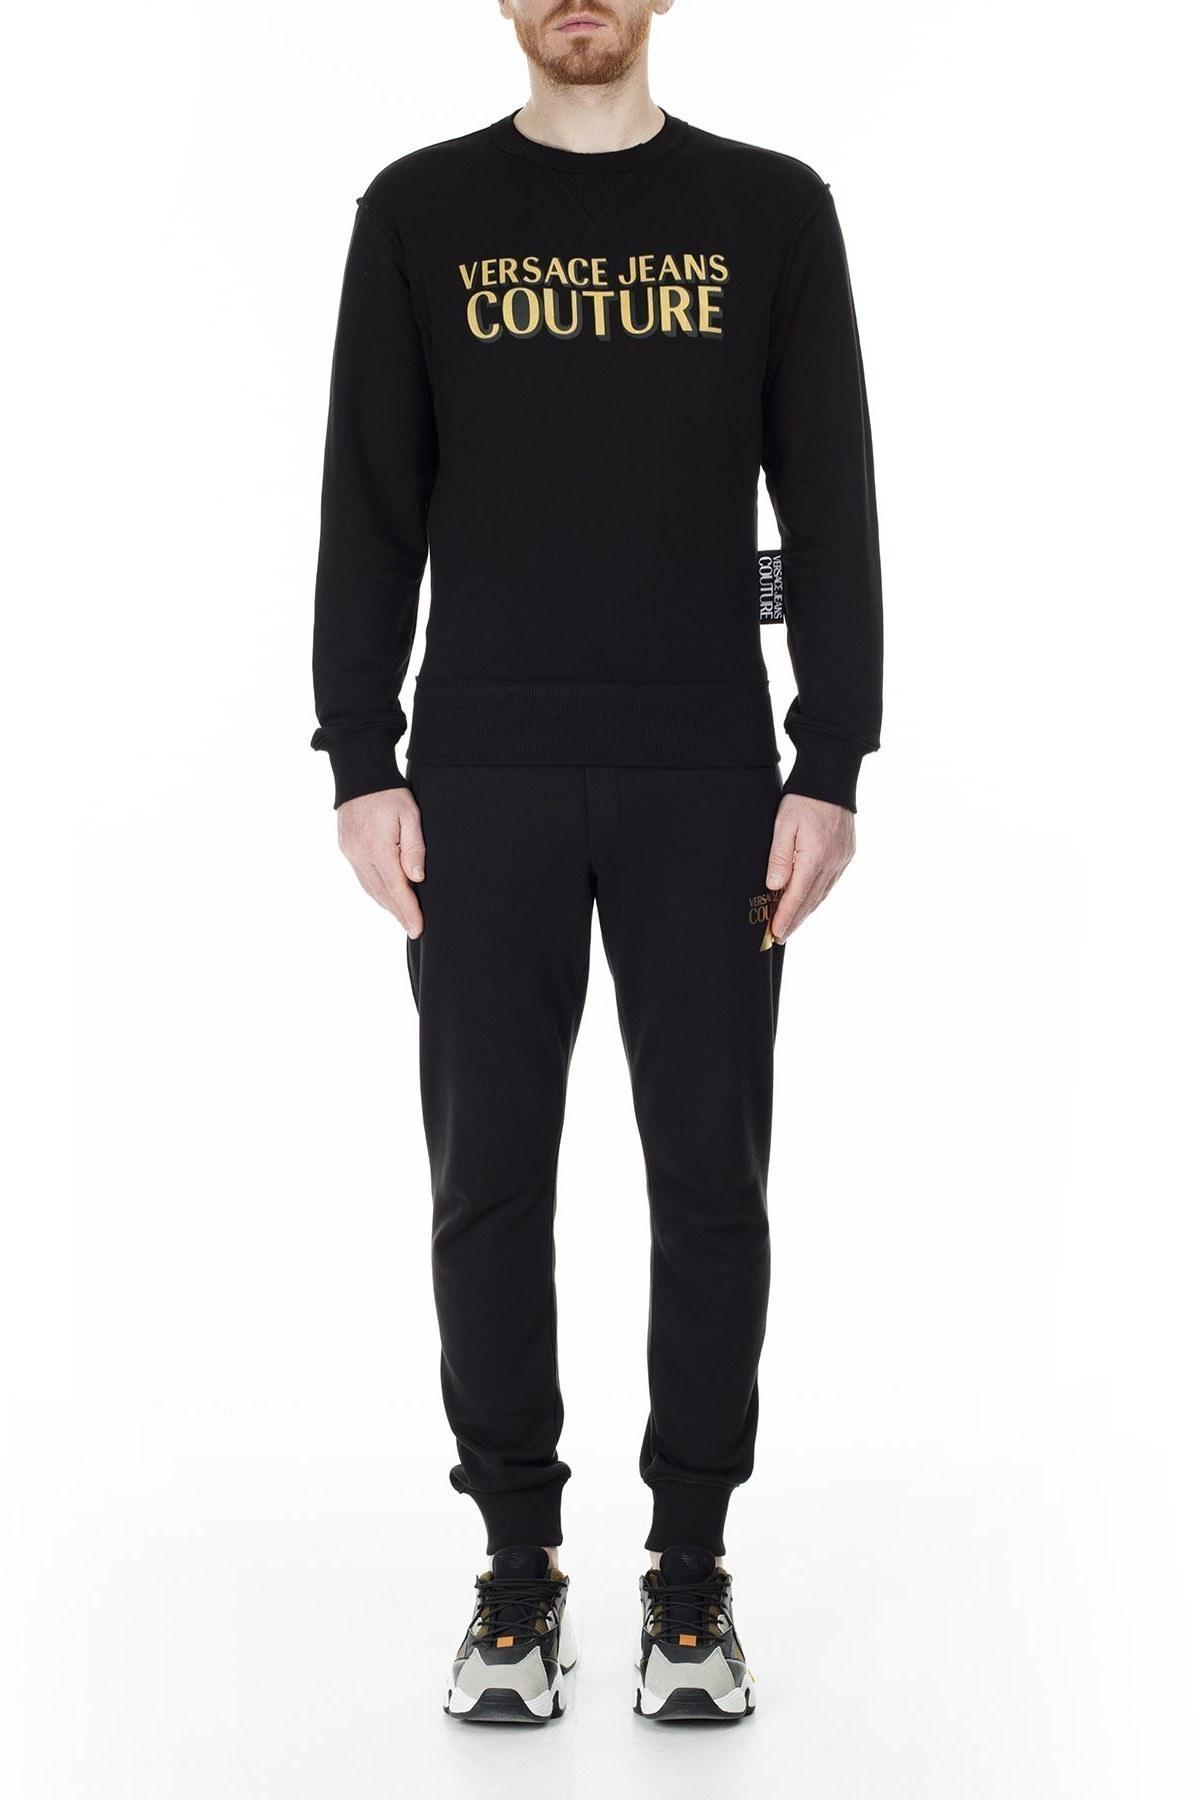 Versace Jeans Couture Slim Fit Erkek Sweat B7GVB7KJ 30328 K42 SİYAH